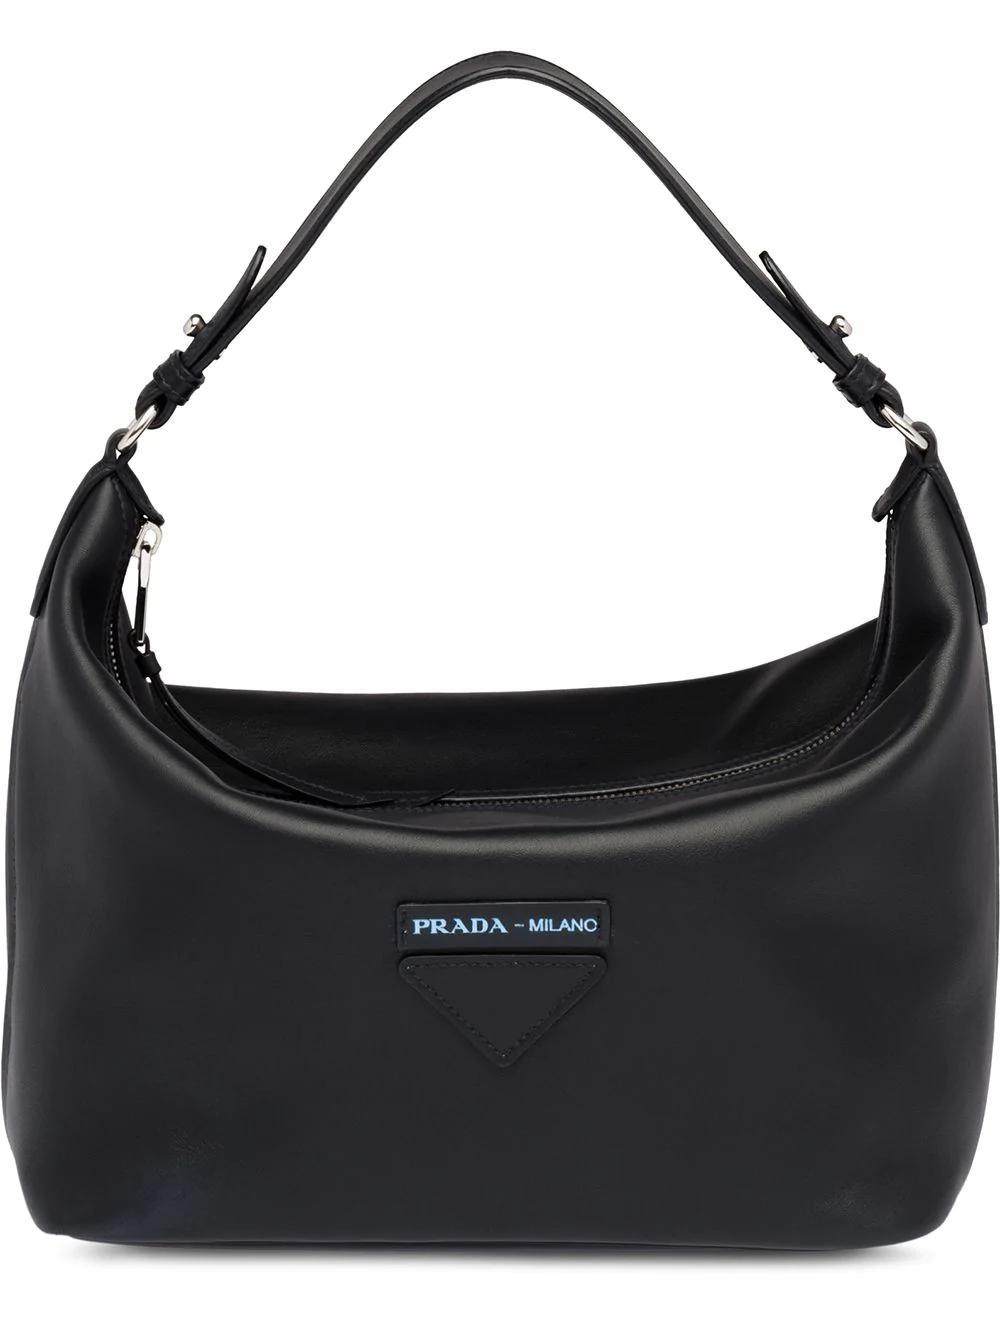 4c65407d2a98 Prada Concept Bag - Black